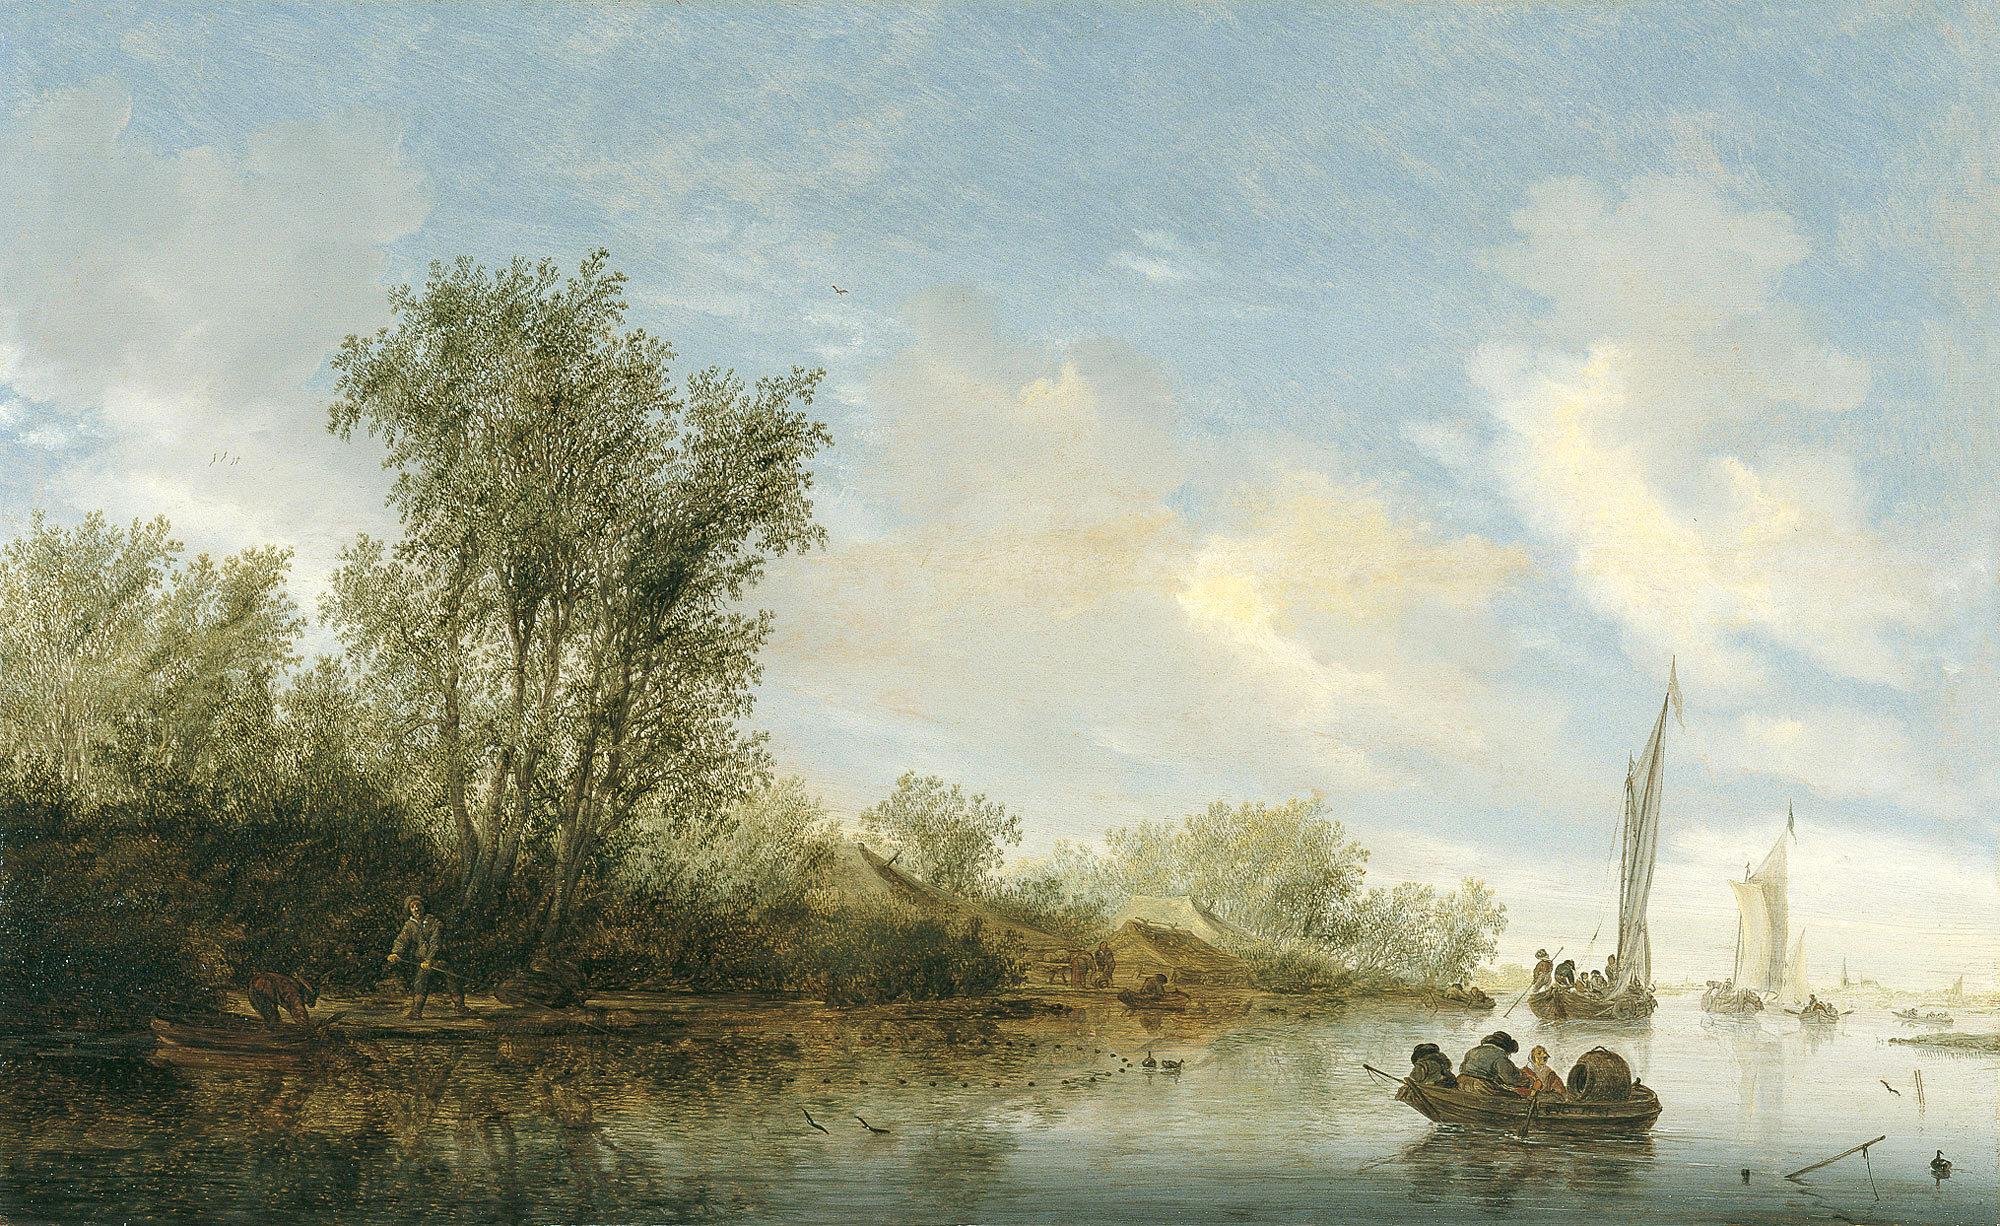 salomon van ruysdael u museo thyssen bornemisza title a river